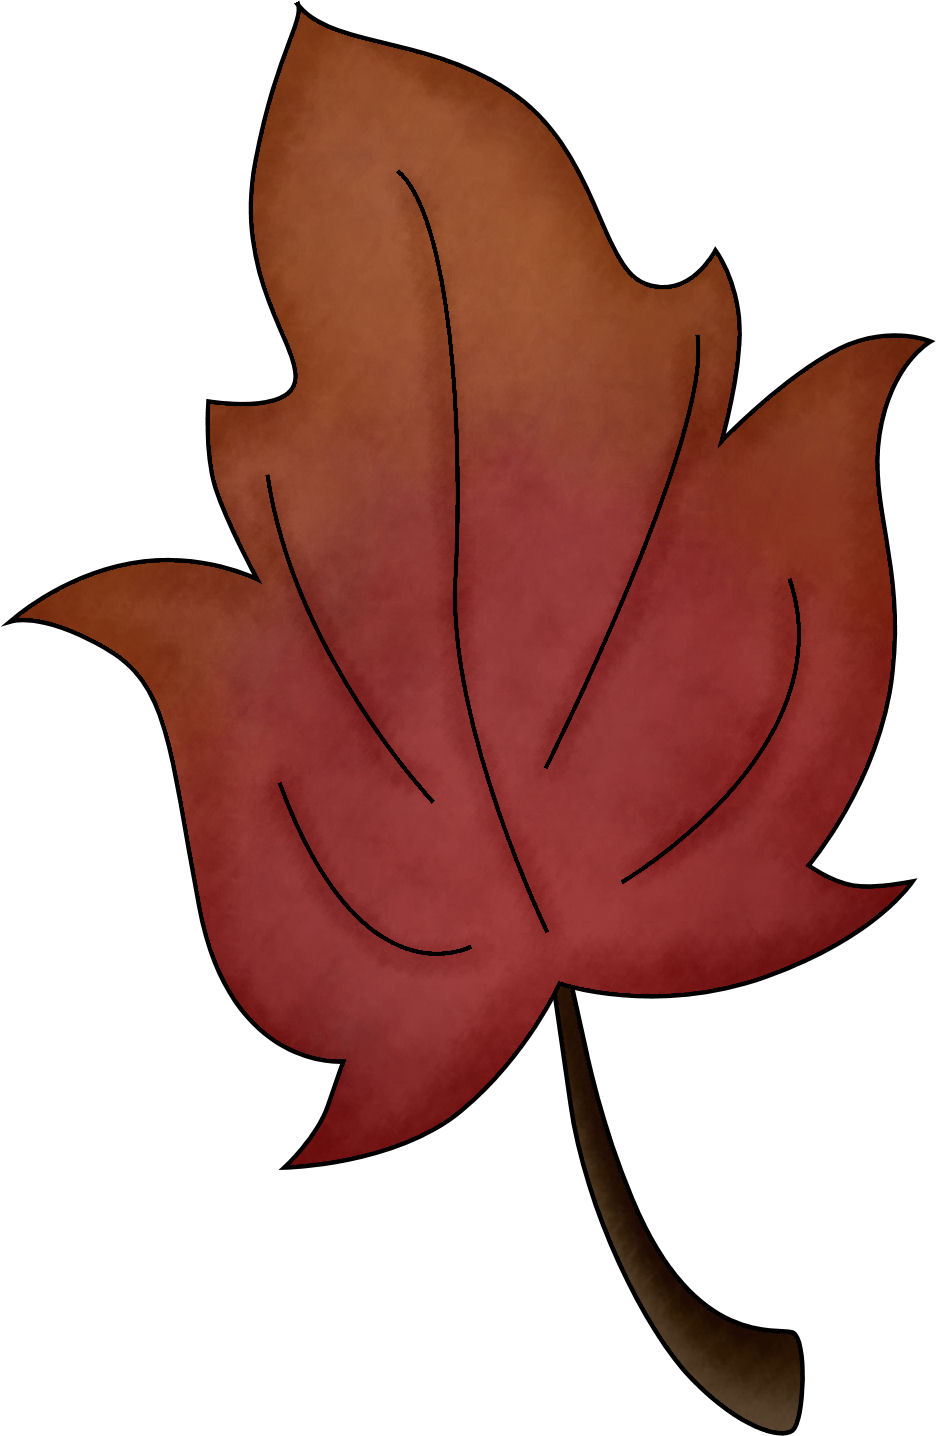 Autumn Leaf Clipart.